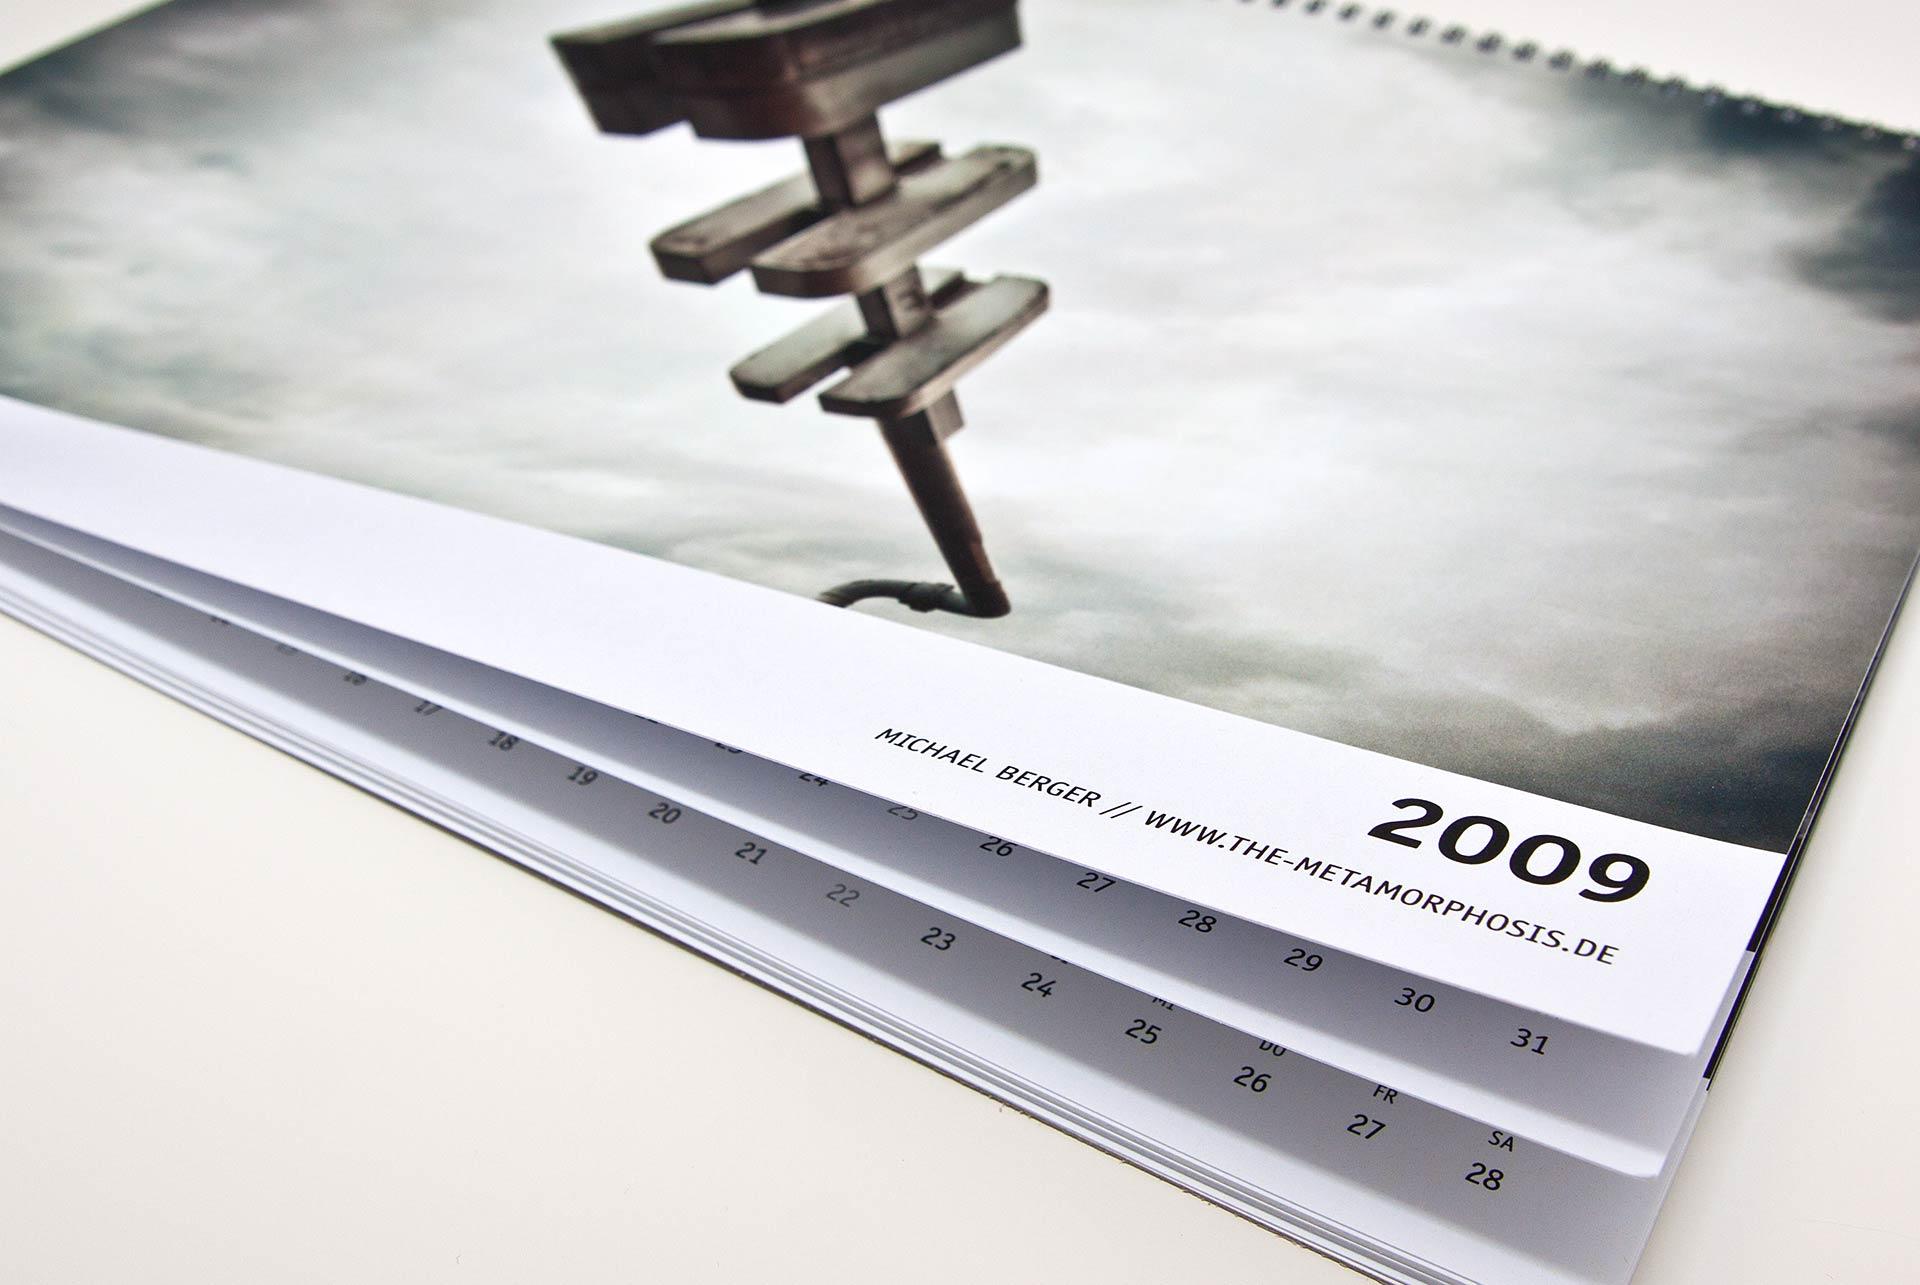 Fotokalender 2009